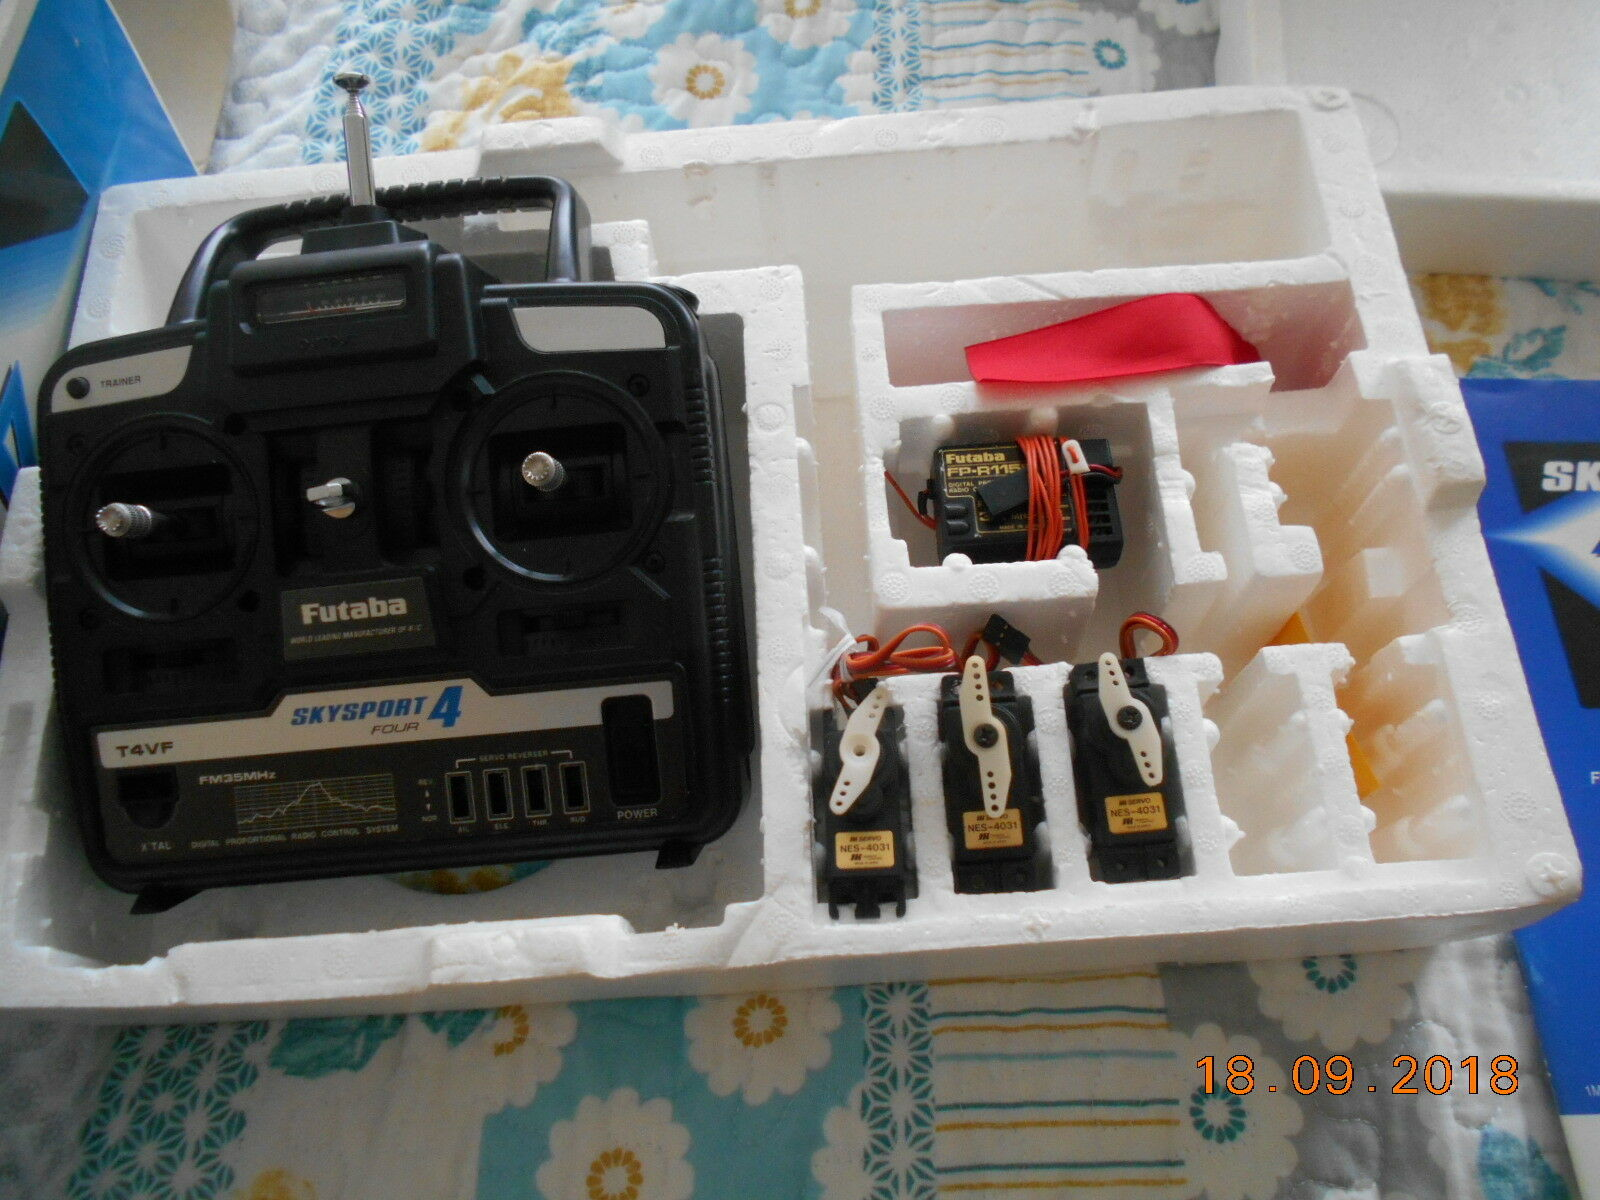 Futaba Skysport T4VF 35MHz FM Transmitter, receiver, servos  for R C BOXED